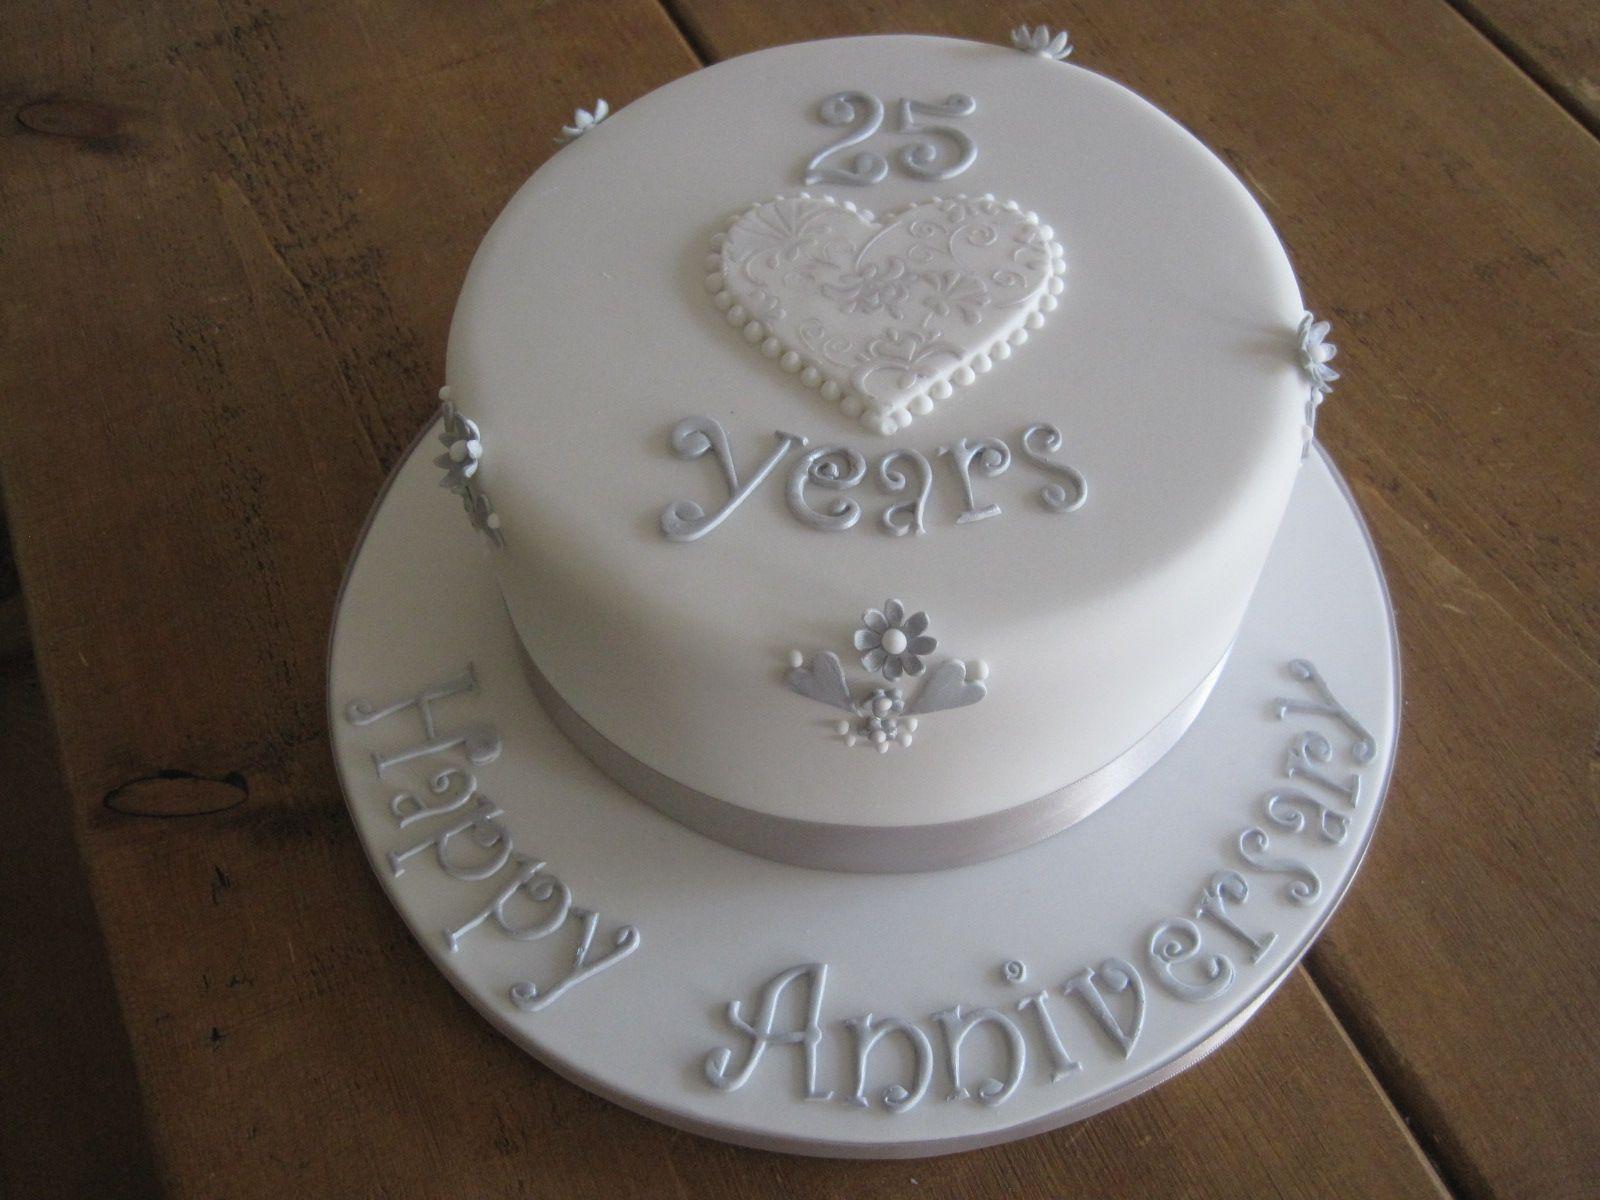 Pasteles Aniversarios Pictures To Pin On Pinterest: Cake Crush: Silver Wedding Anniversary Fruit Cake